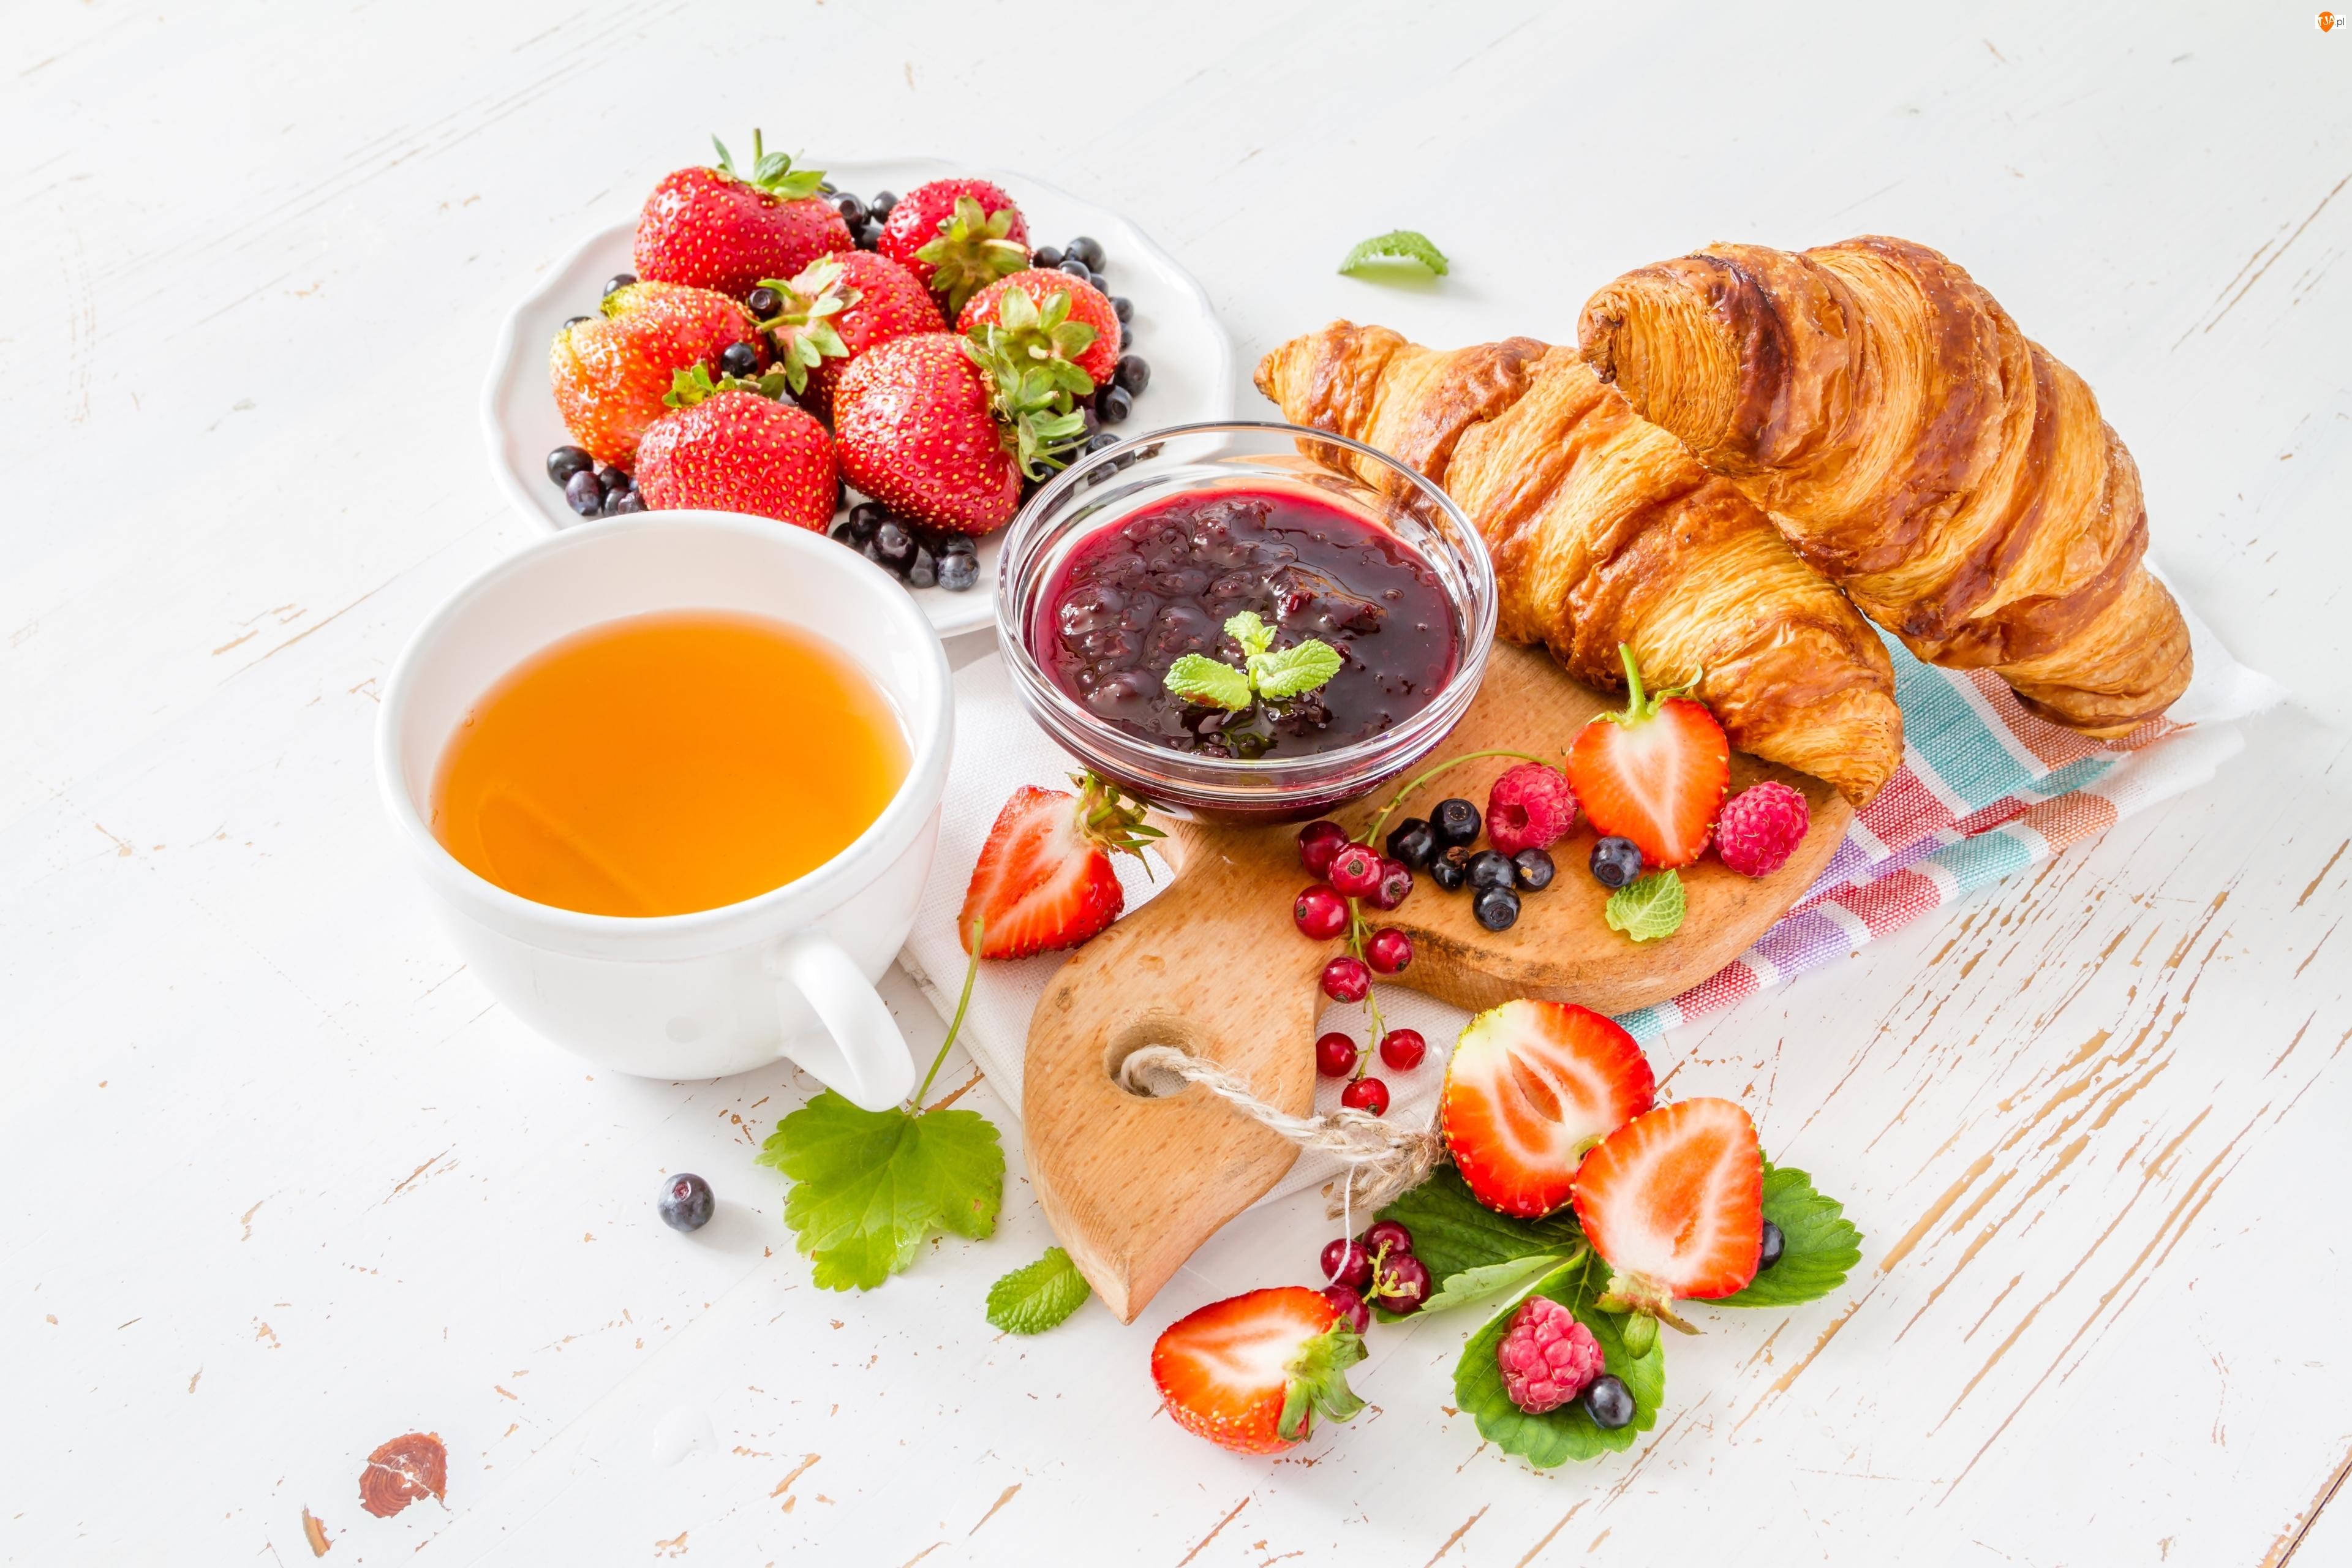 Dżem, Śniadanie, Owoce, Herbata, Rogale